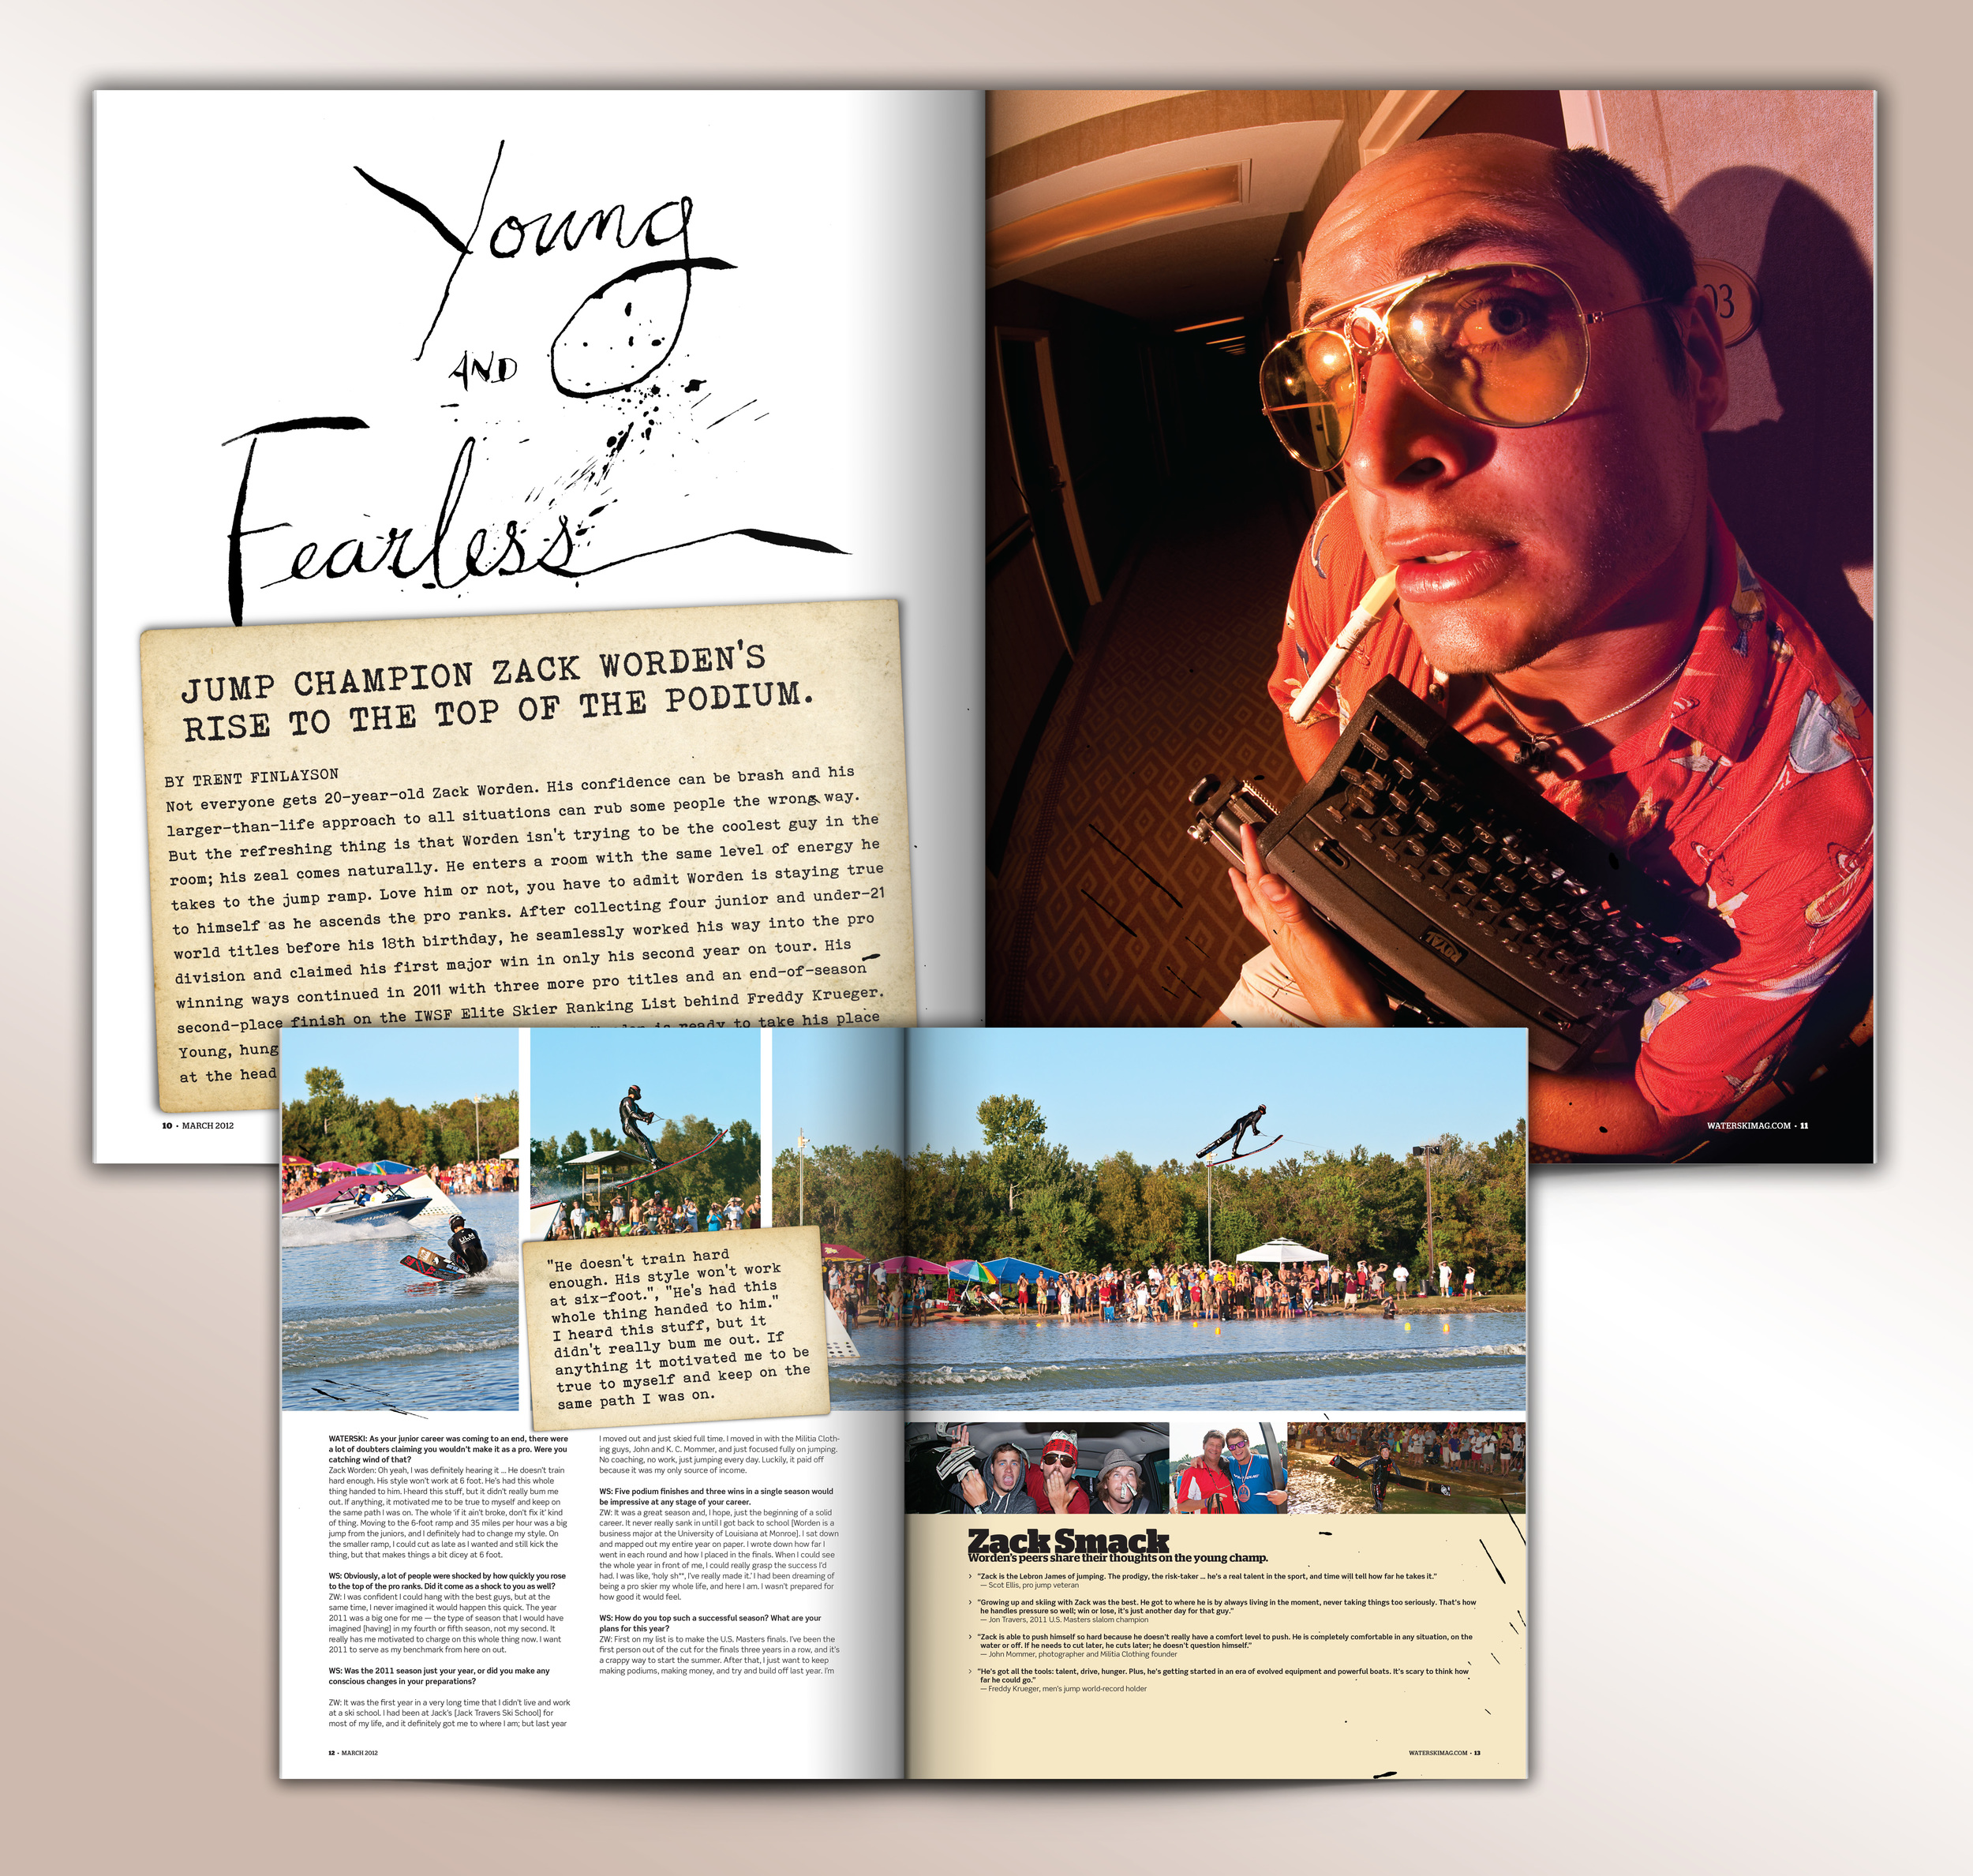 Waterski_Magazine_pages_layout_3.jpg